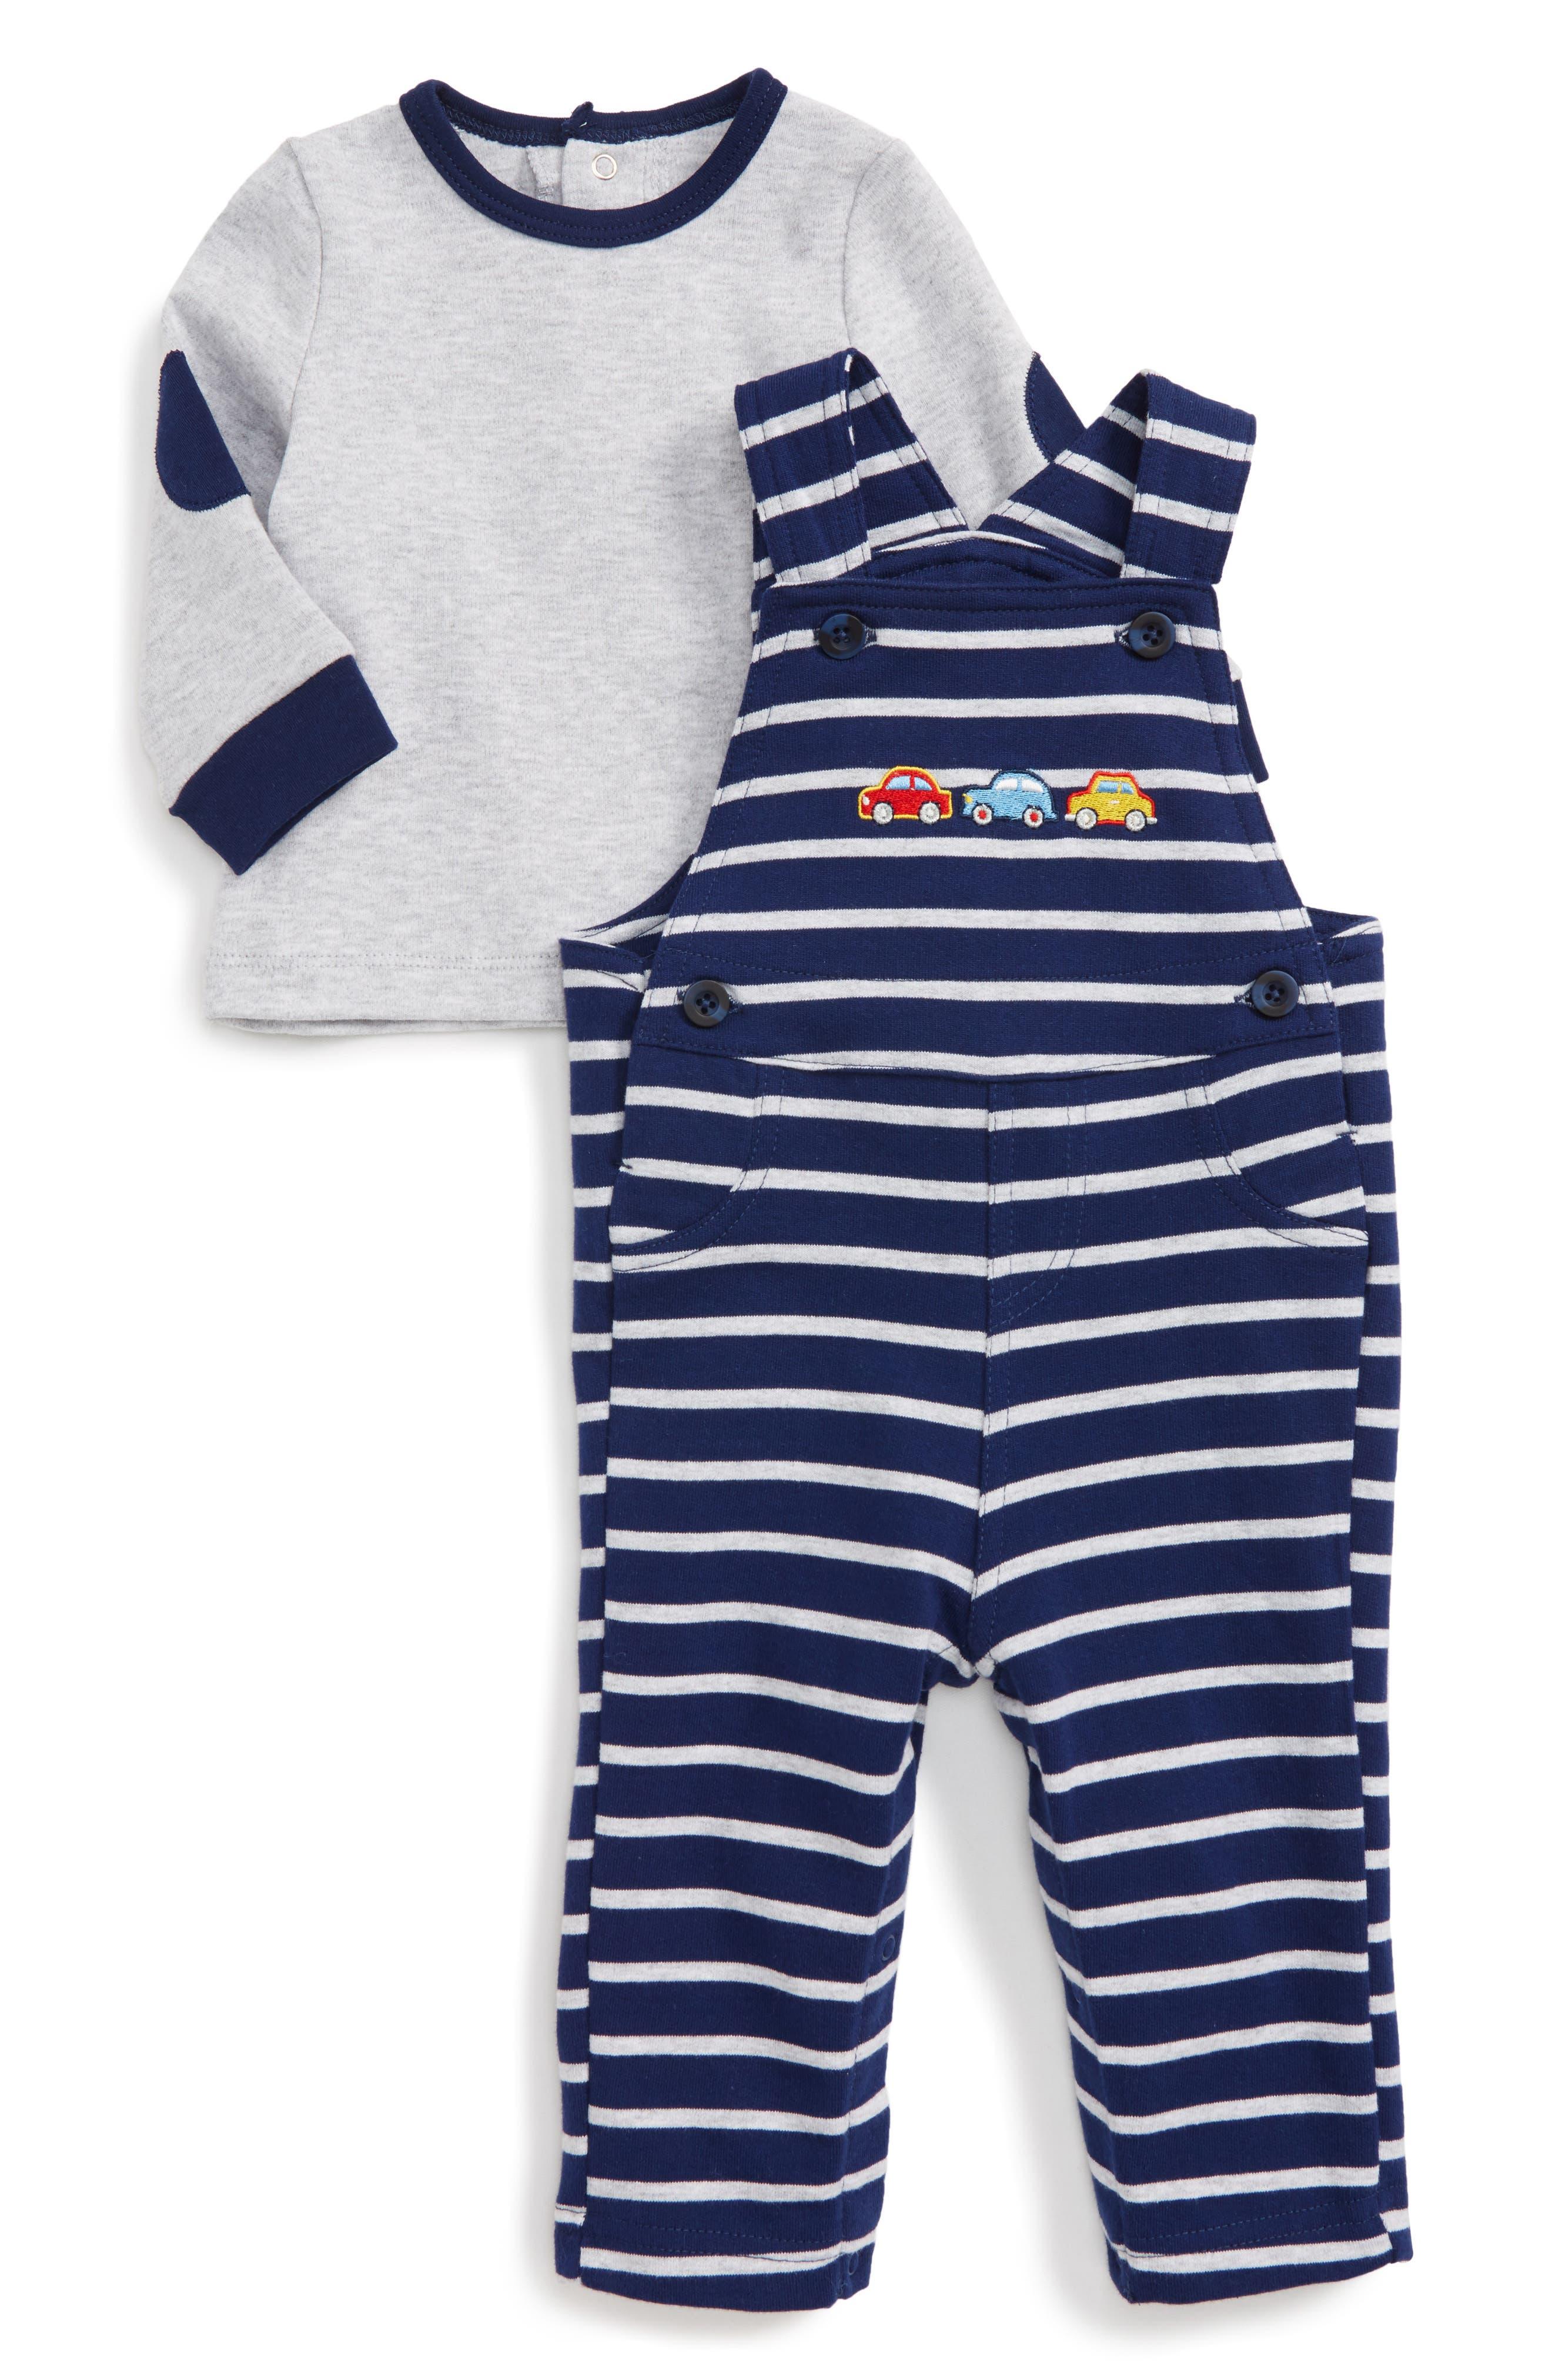 Main Image - Little Me Car T-Shirt & Overalls Set (Baby Boys)